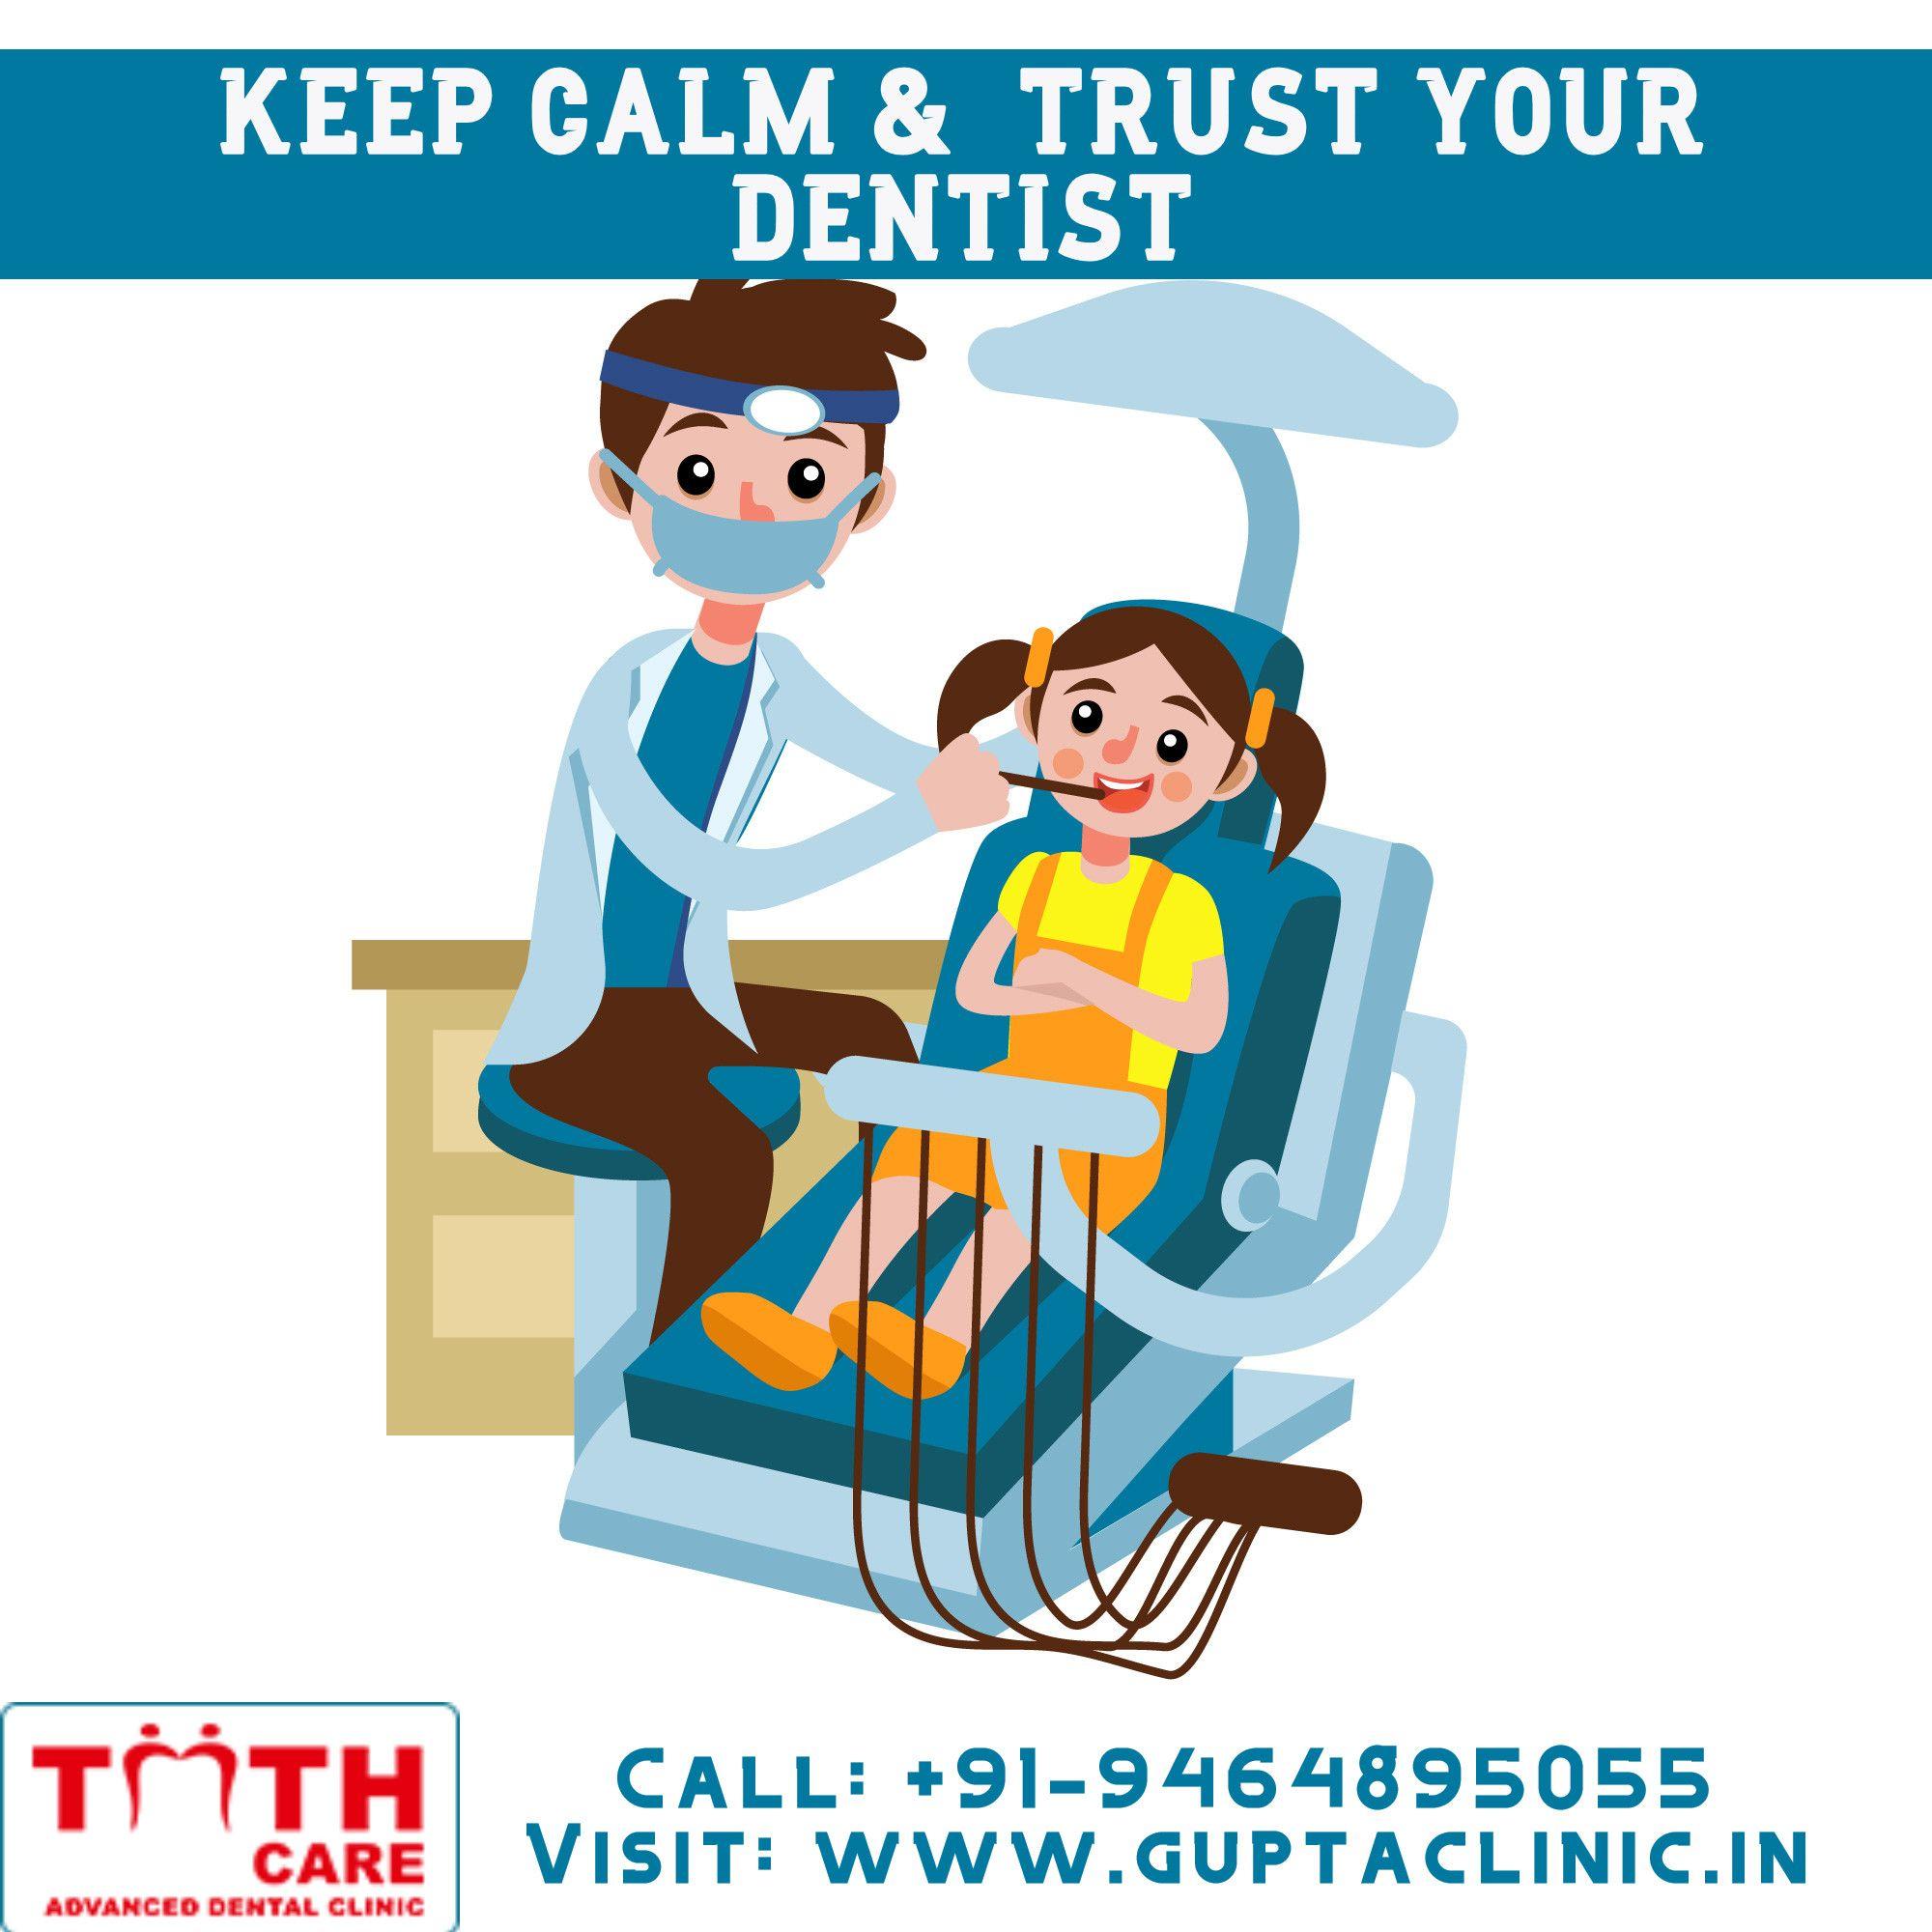 Keep calm trust your dentist kids dentist pediatric